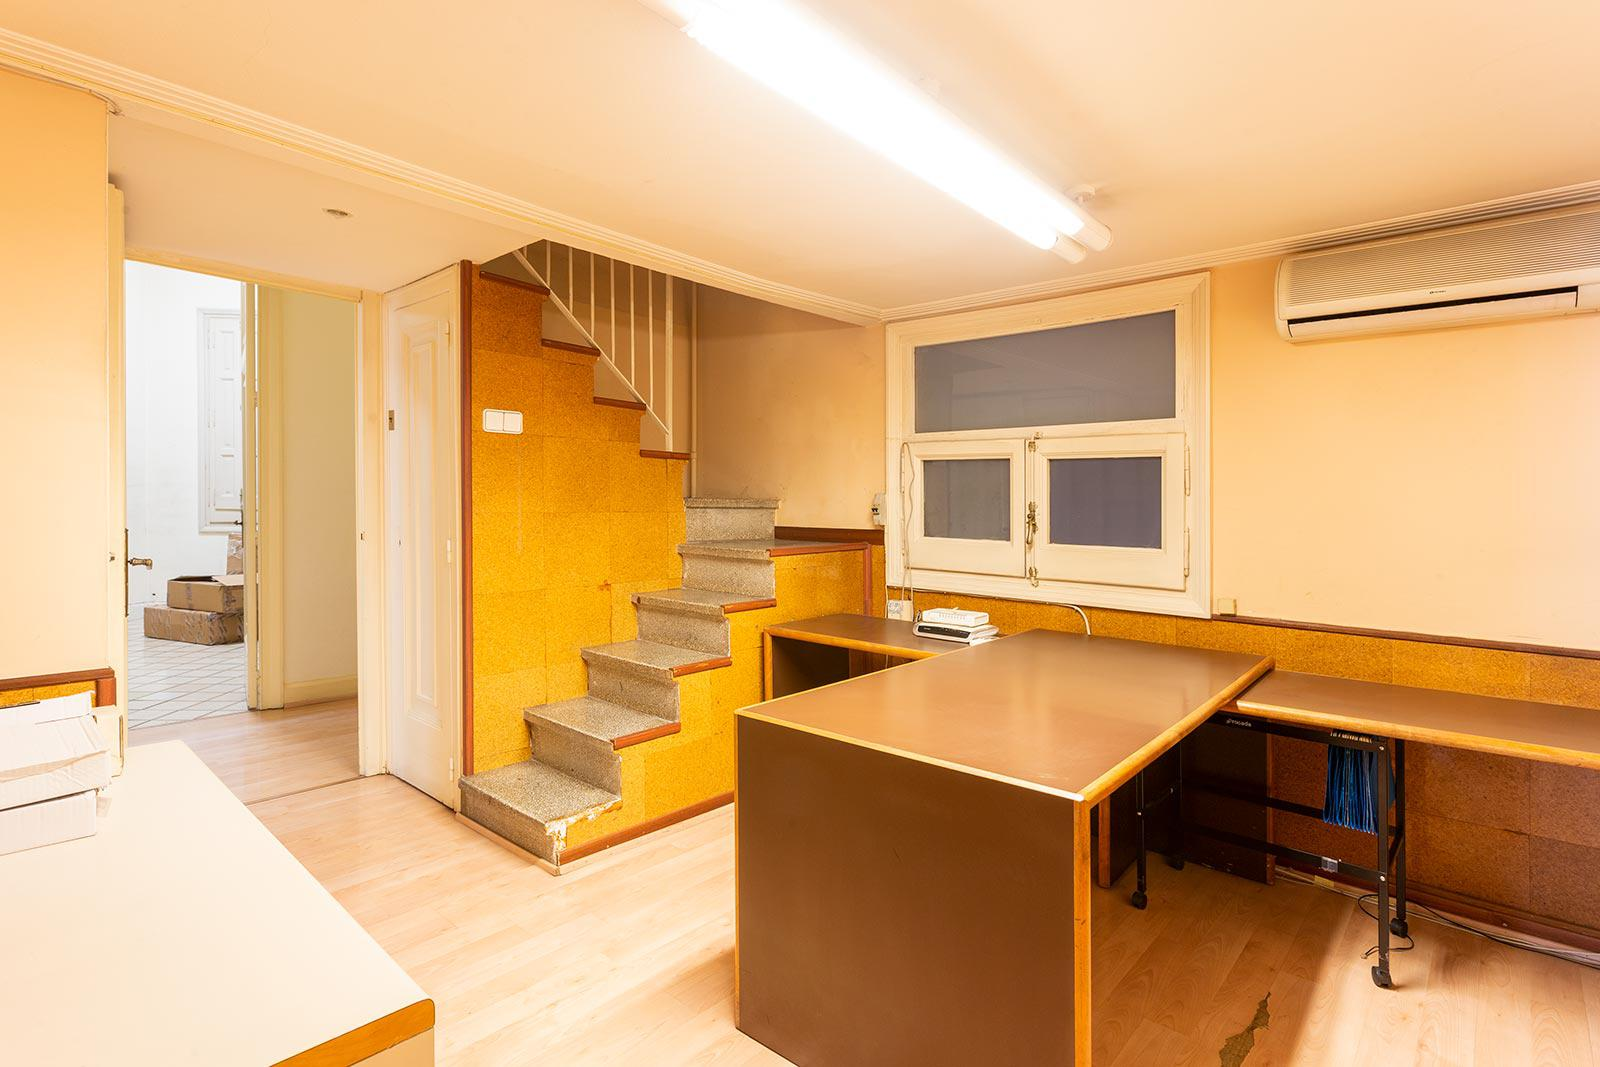 214993 Apartamento en venda en Eixample, Dreta Eixample 17